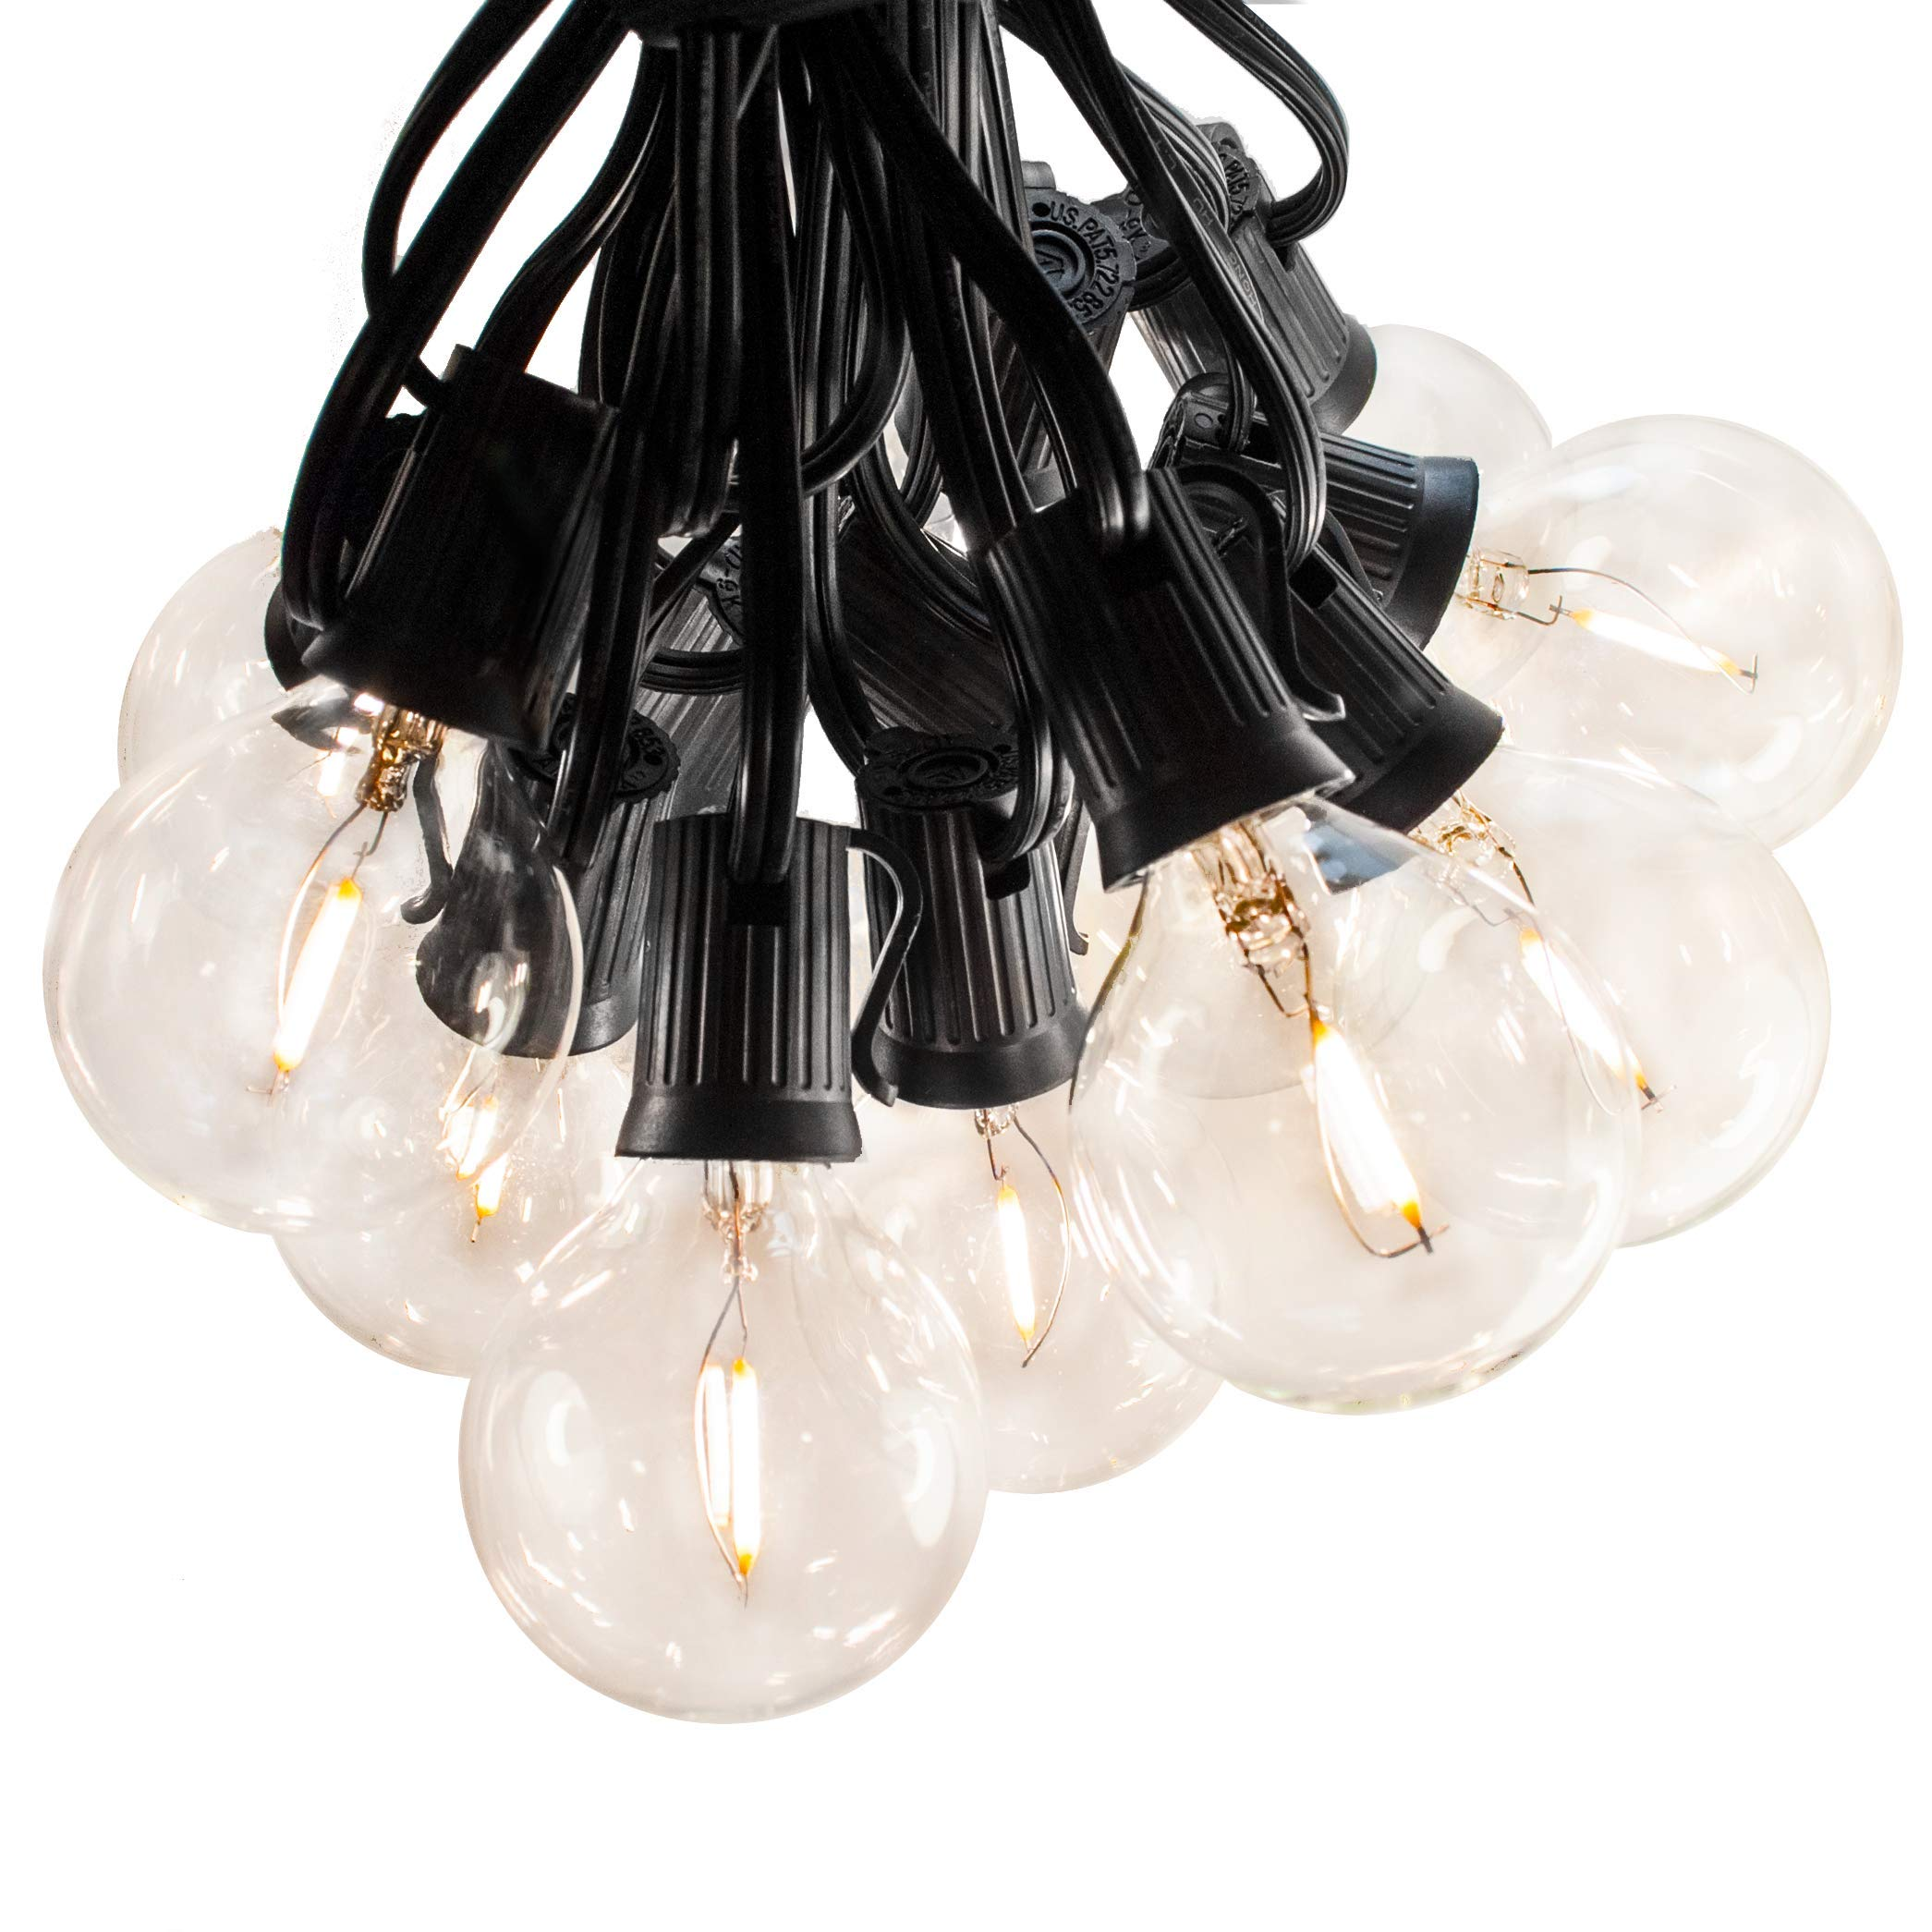 Hometown Evolution, Inc. Outdoor Globe String Lights (100 Foot, LED Filament G50 Clear - Black Wire - 2 Inch .6 Watt Bulbs)